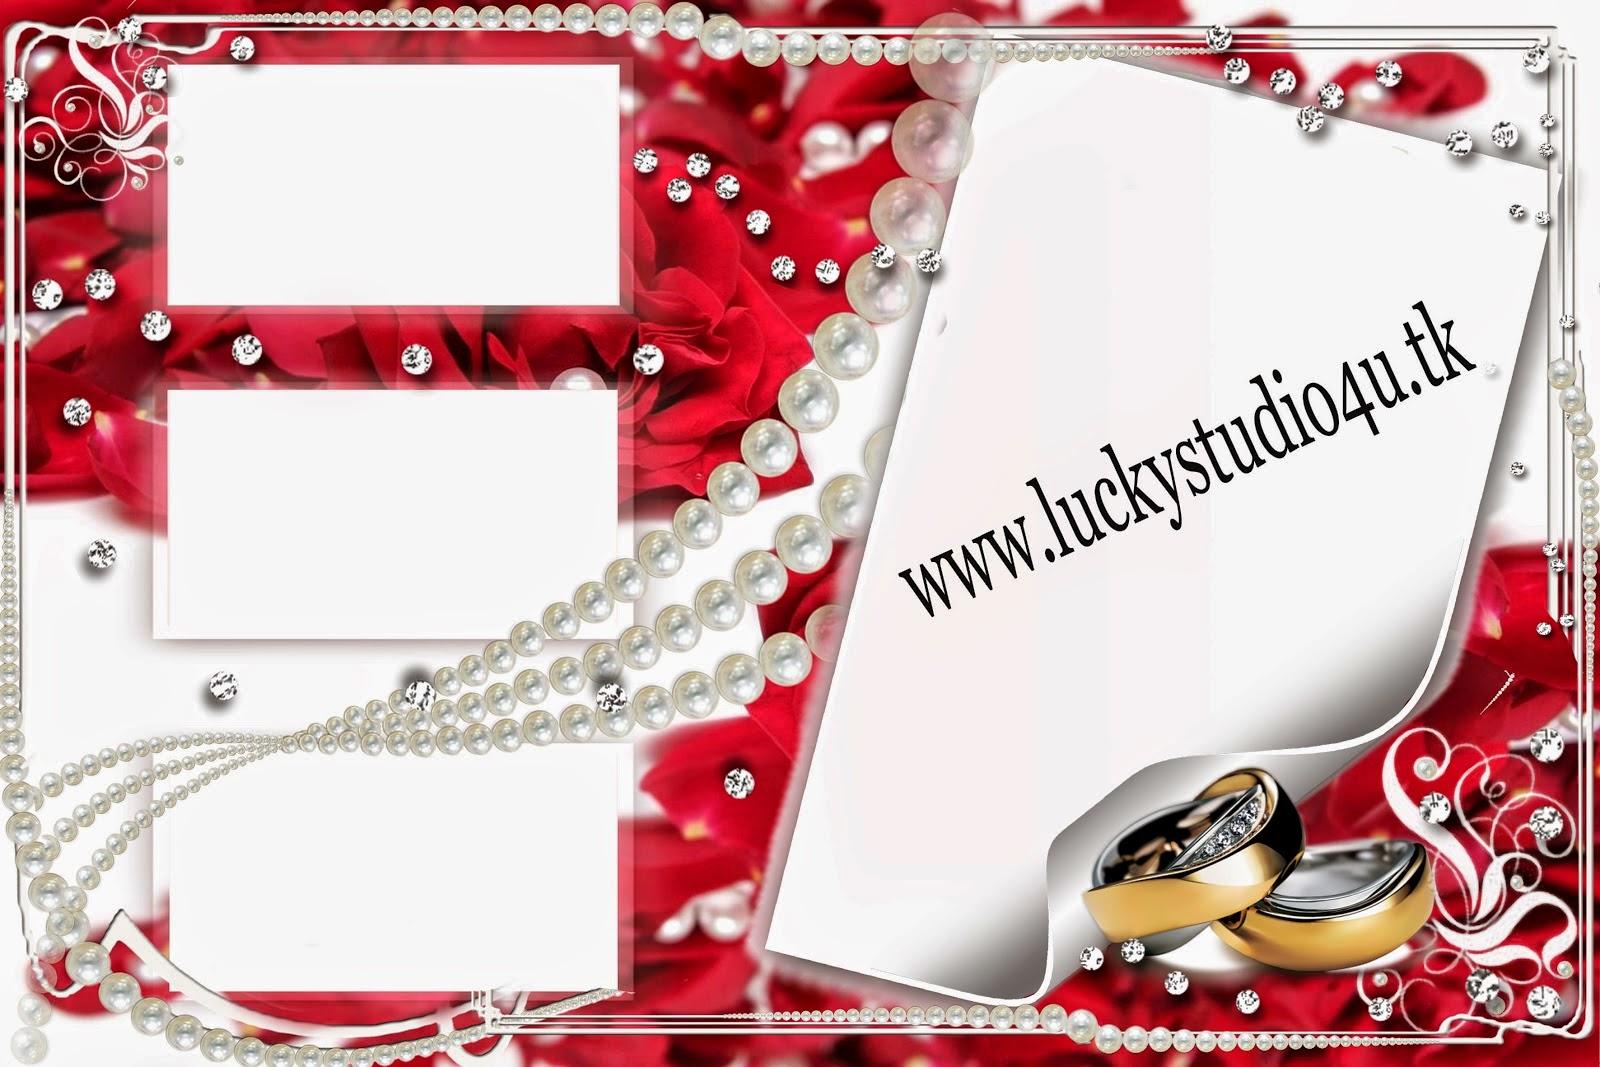 Wedding Frames Psd Free Download - Frame Design & Reviews ✓